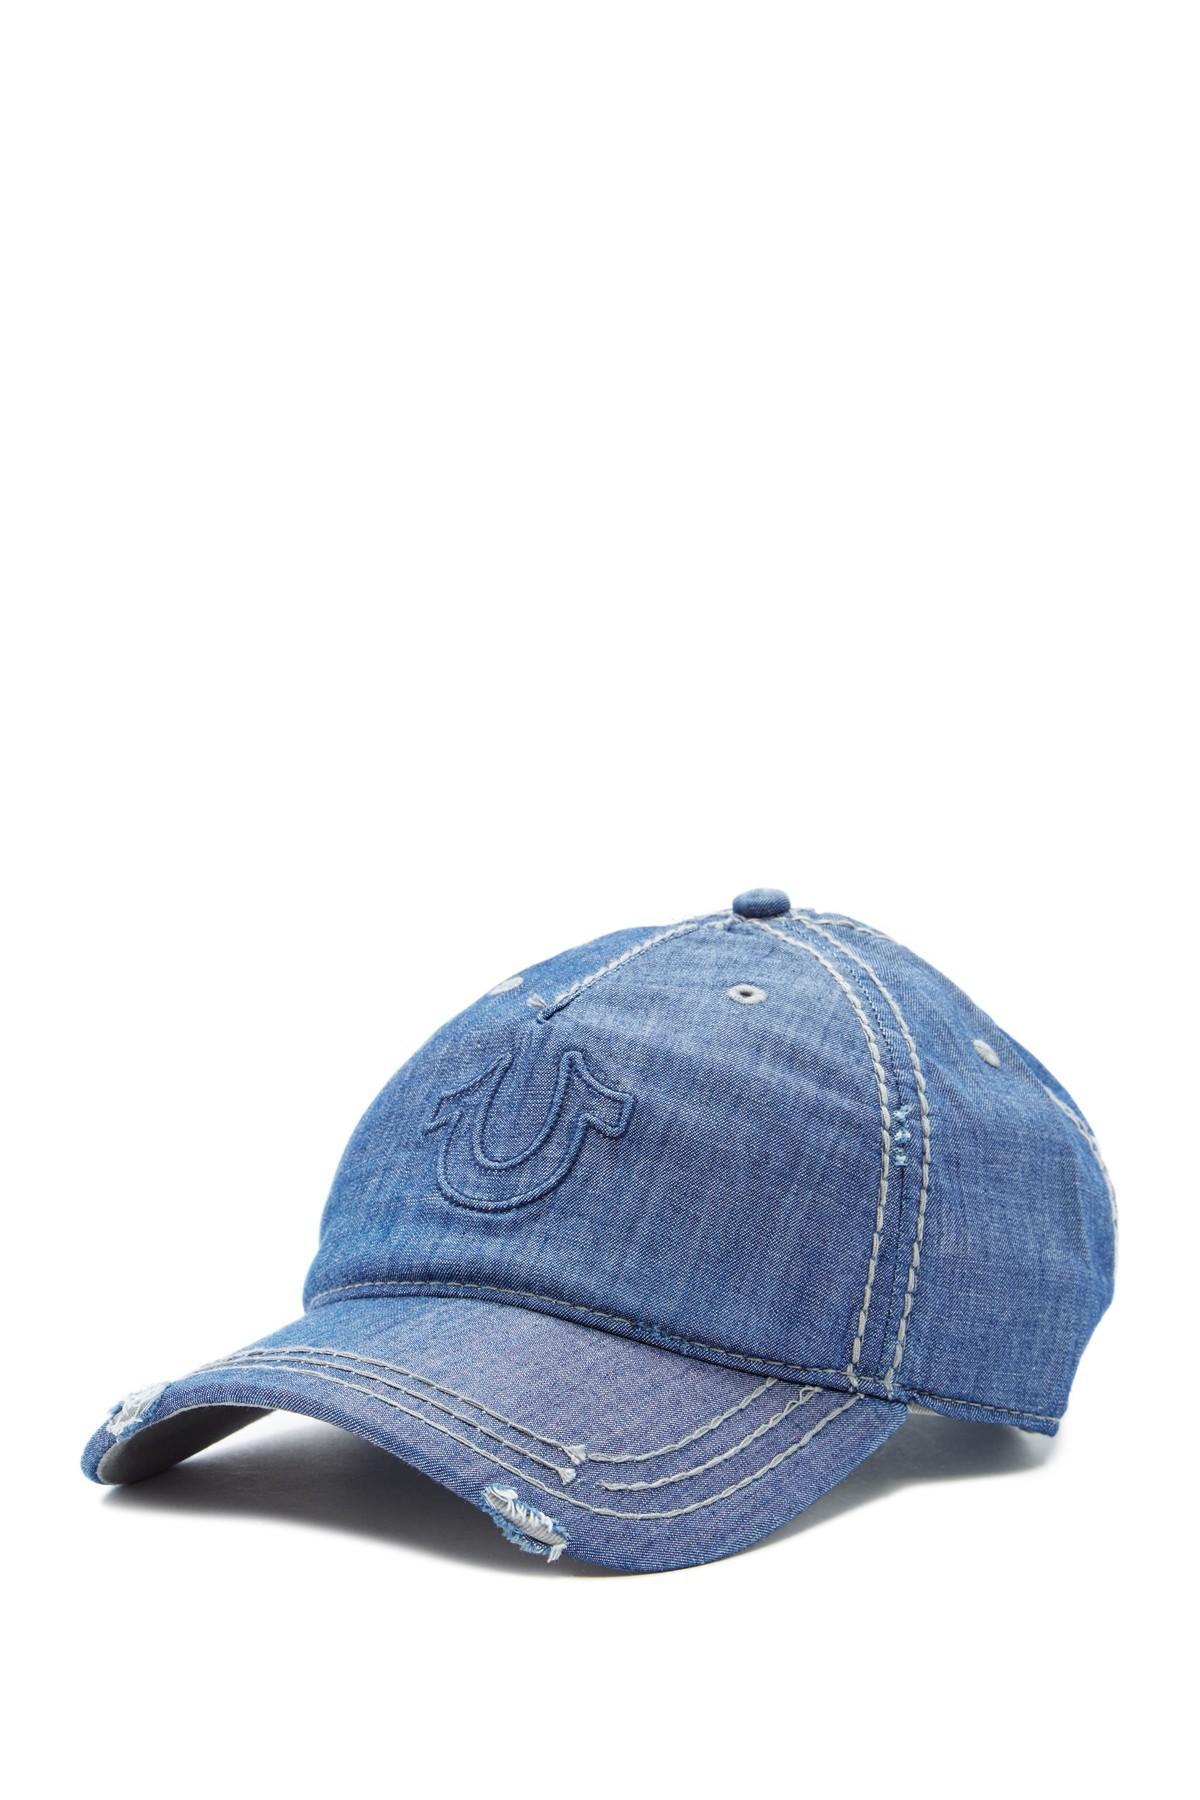 27c2255f Lyst - True Religion Distressed Horseshoe Baseball Cap in Blue for Men